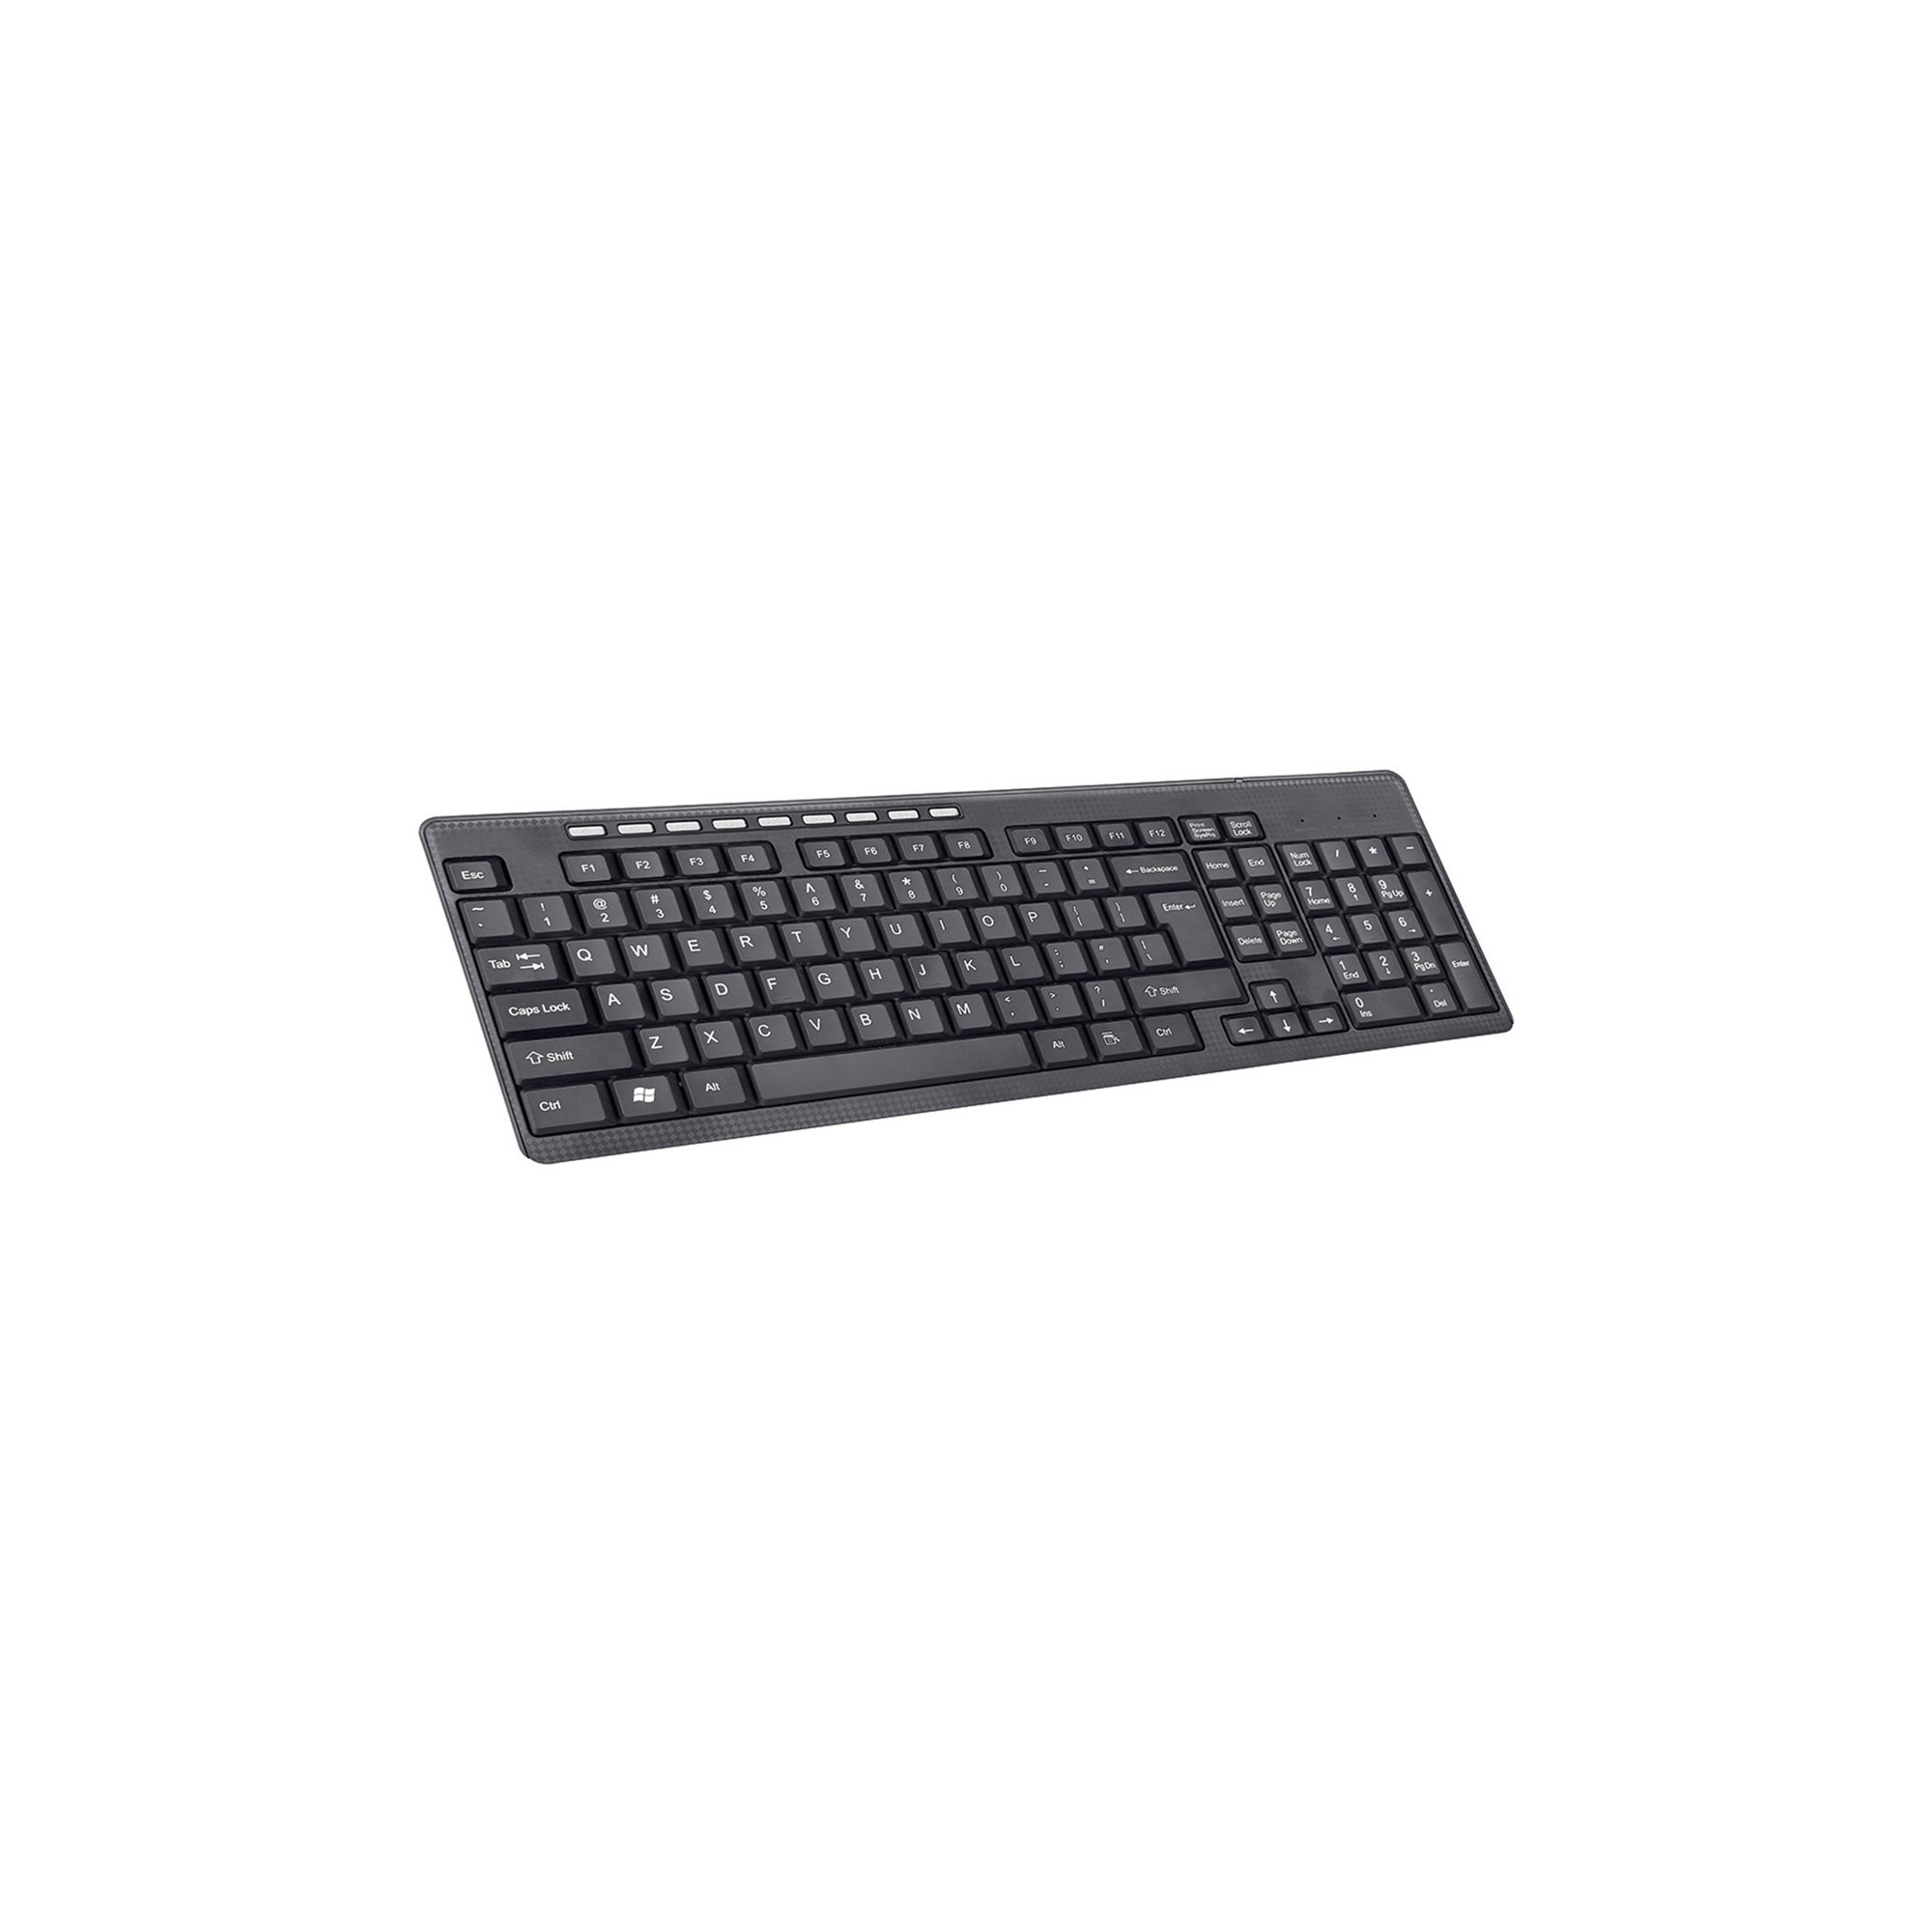 Image of Infapower Full Size Wireless Keyboard